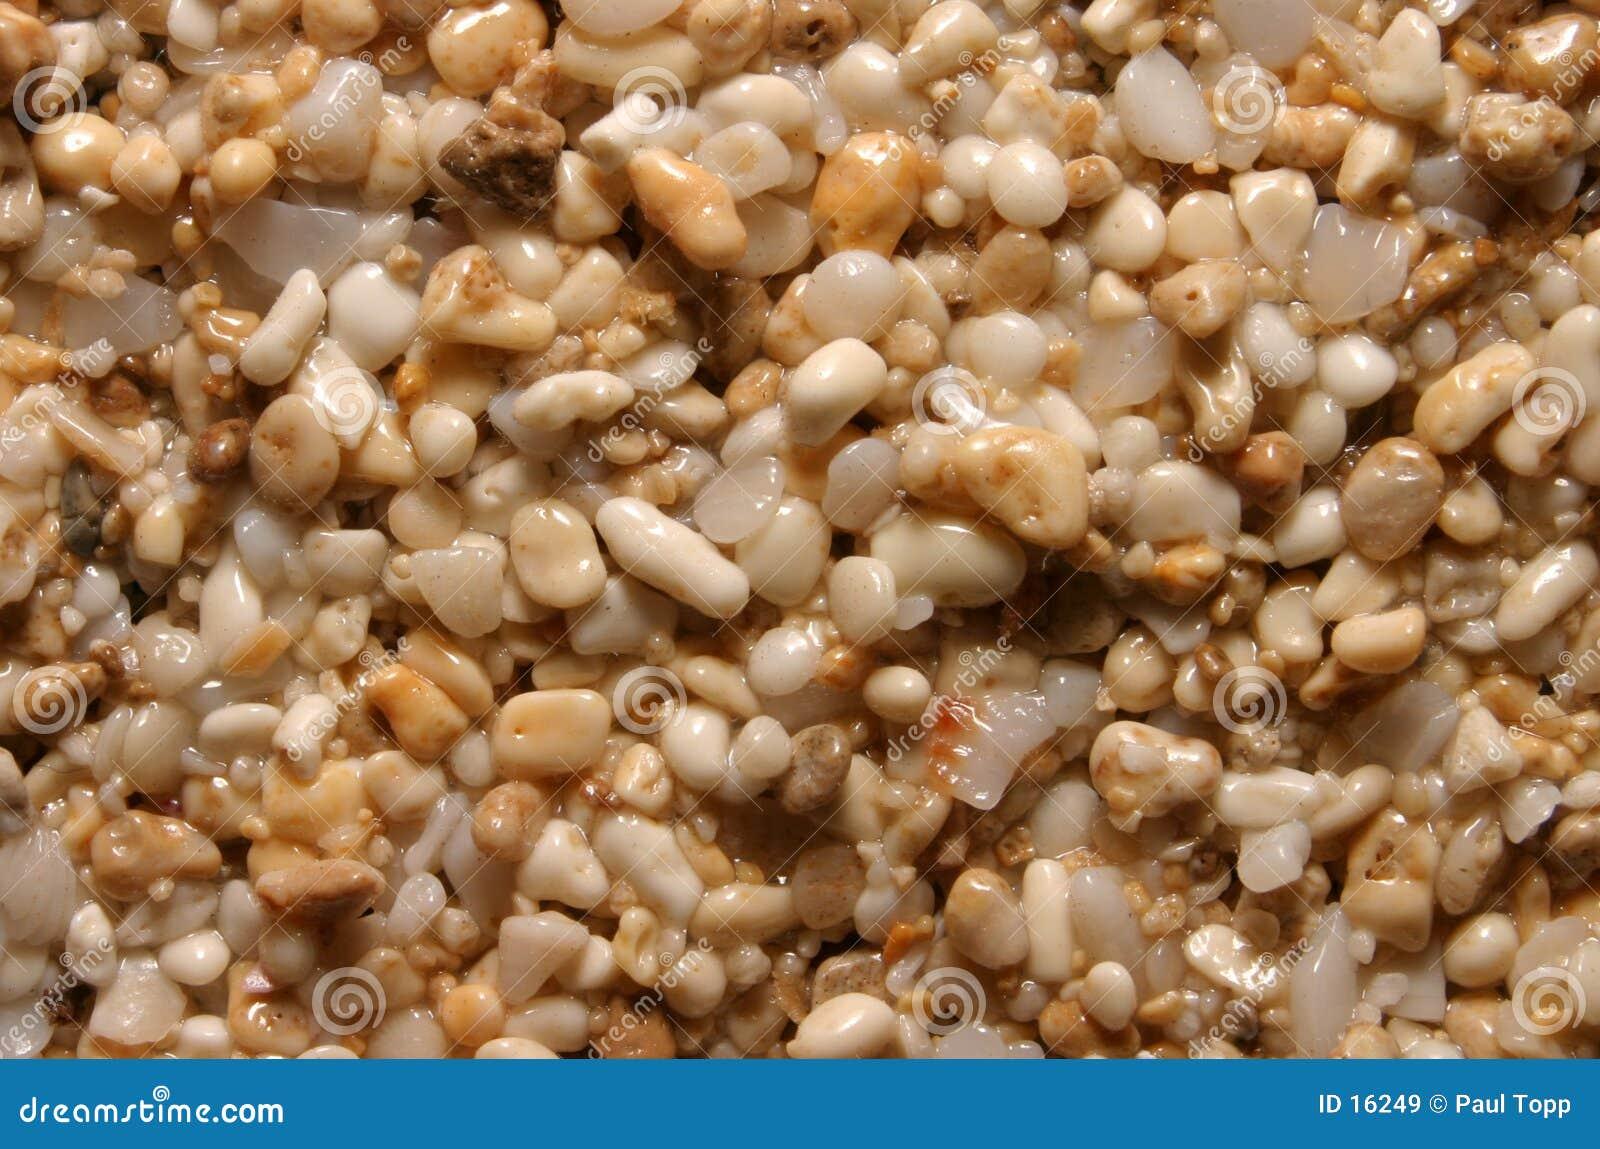 зерна предпосылки зашкурят текстуру